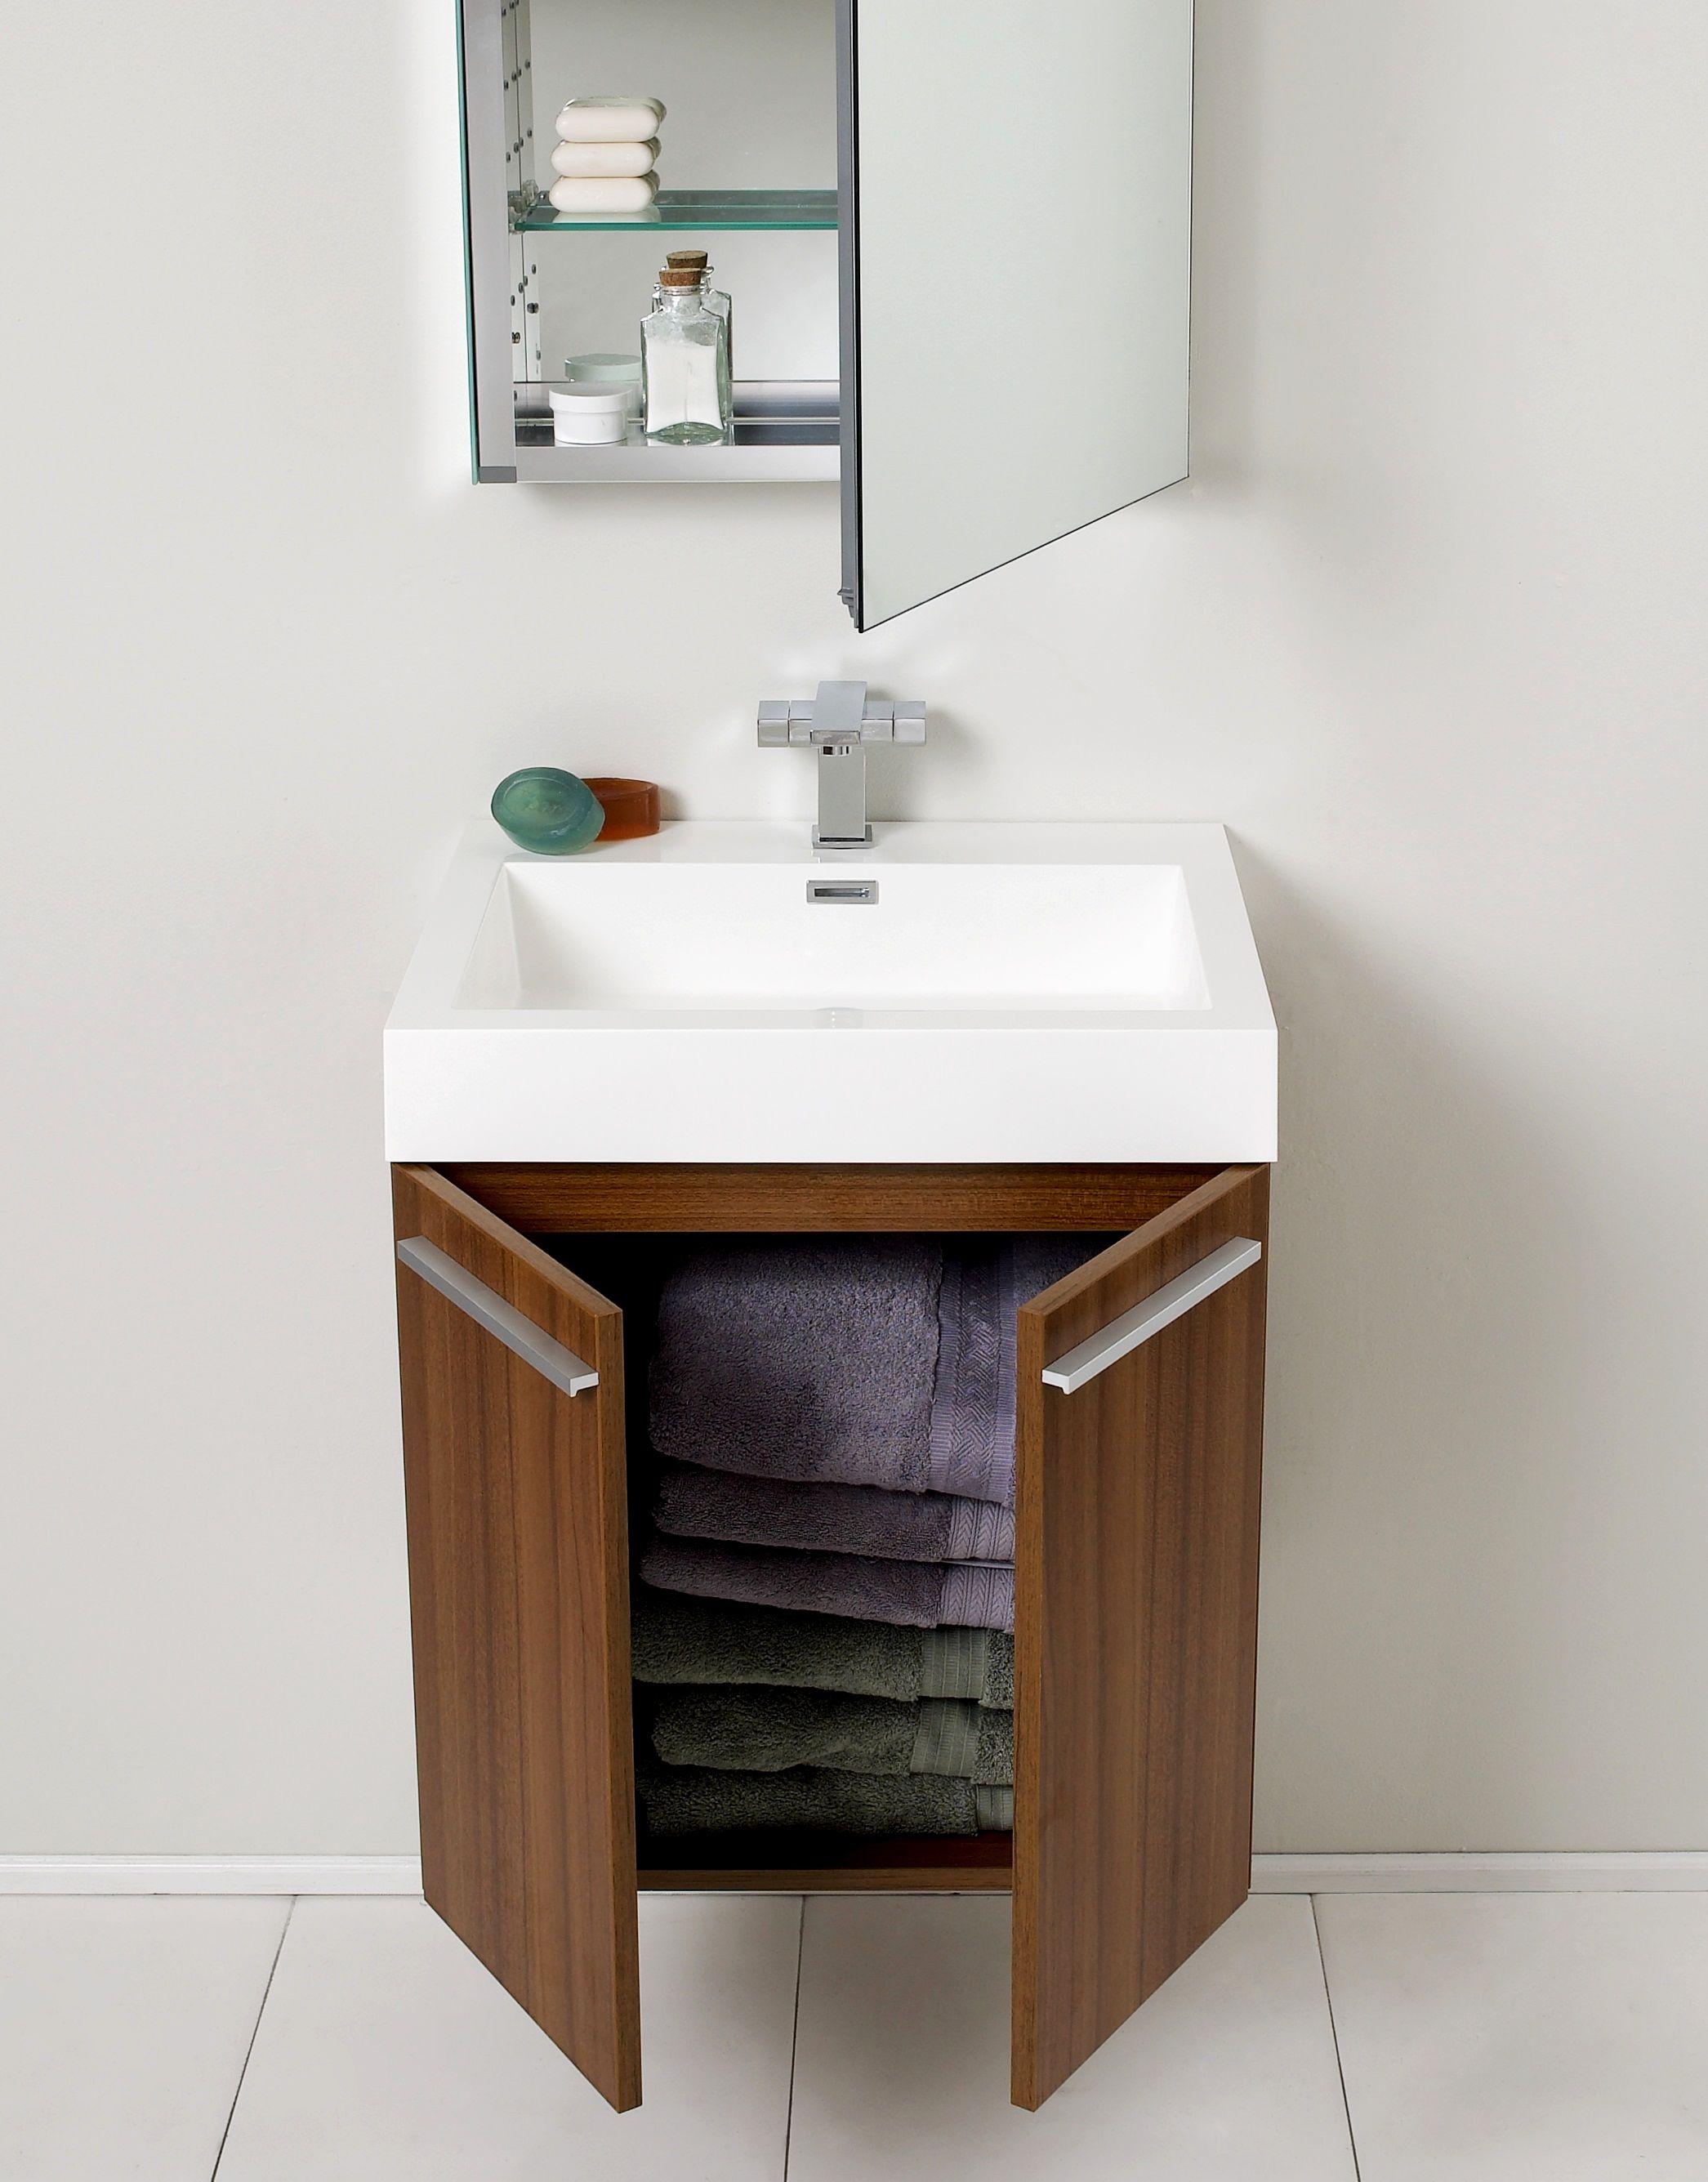 elegant floating bathroom cabinets décor-Terrific Floating Bathroom Cabinets Photograph